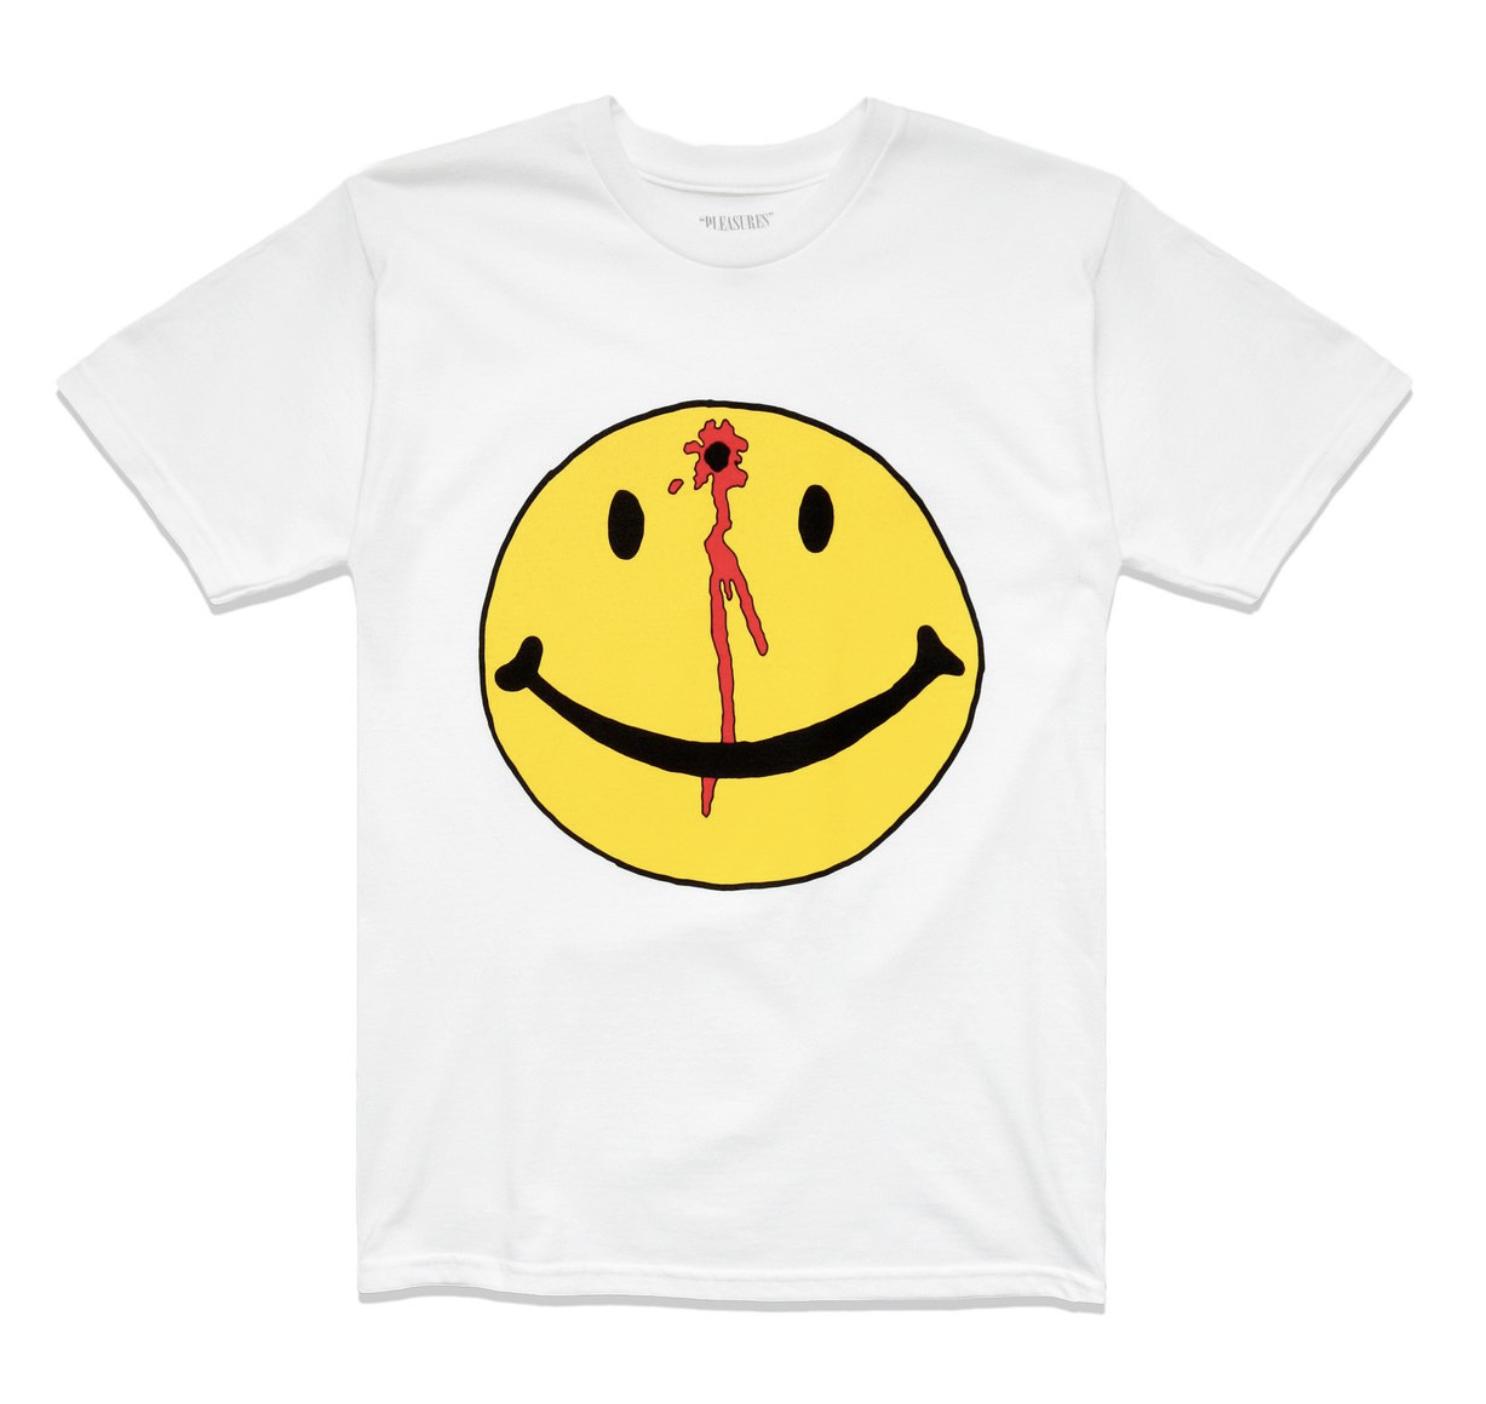 4. Chinatown Market Smiley Tee - Brand: PleasuresPrice: $36.00